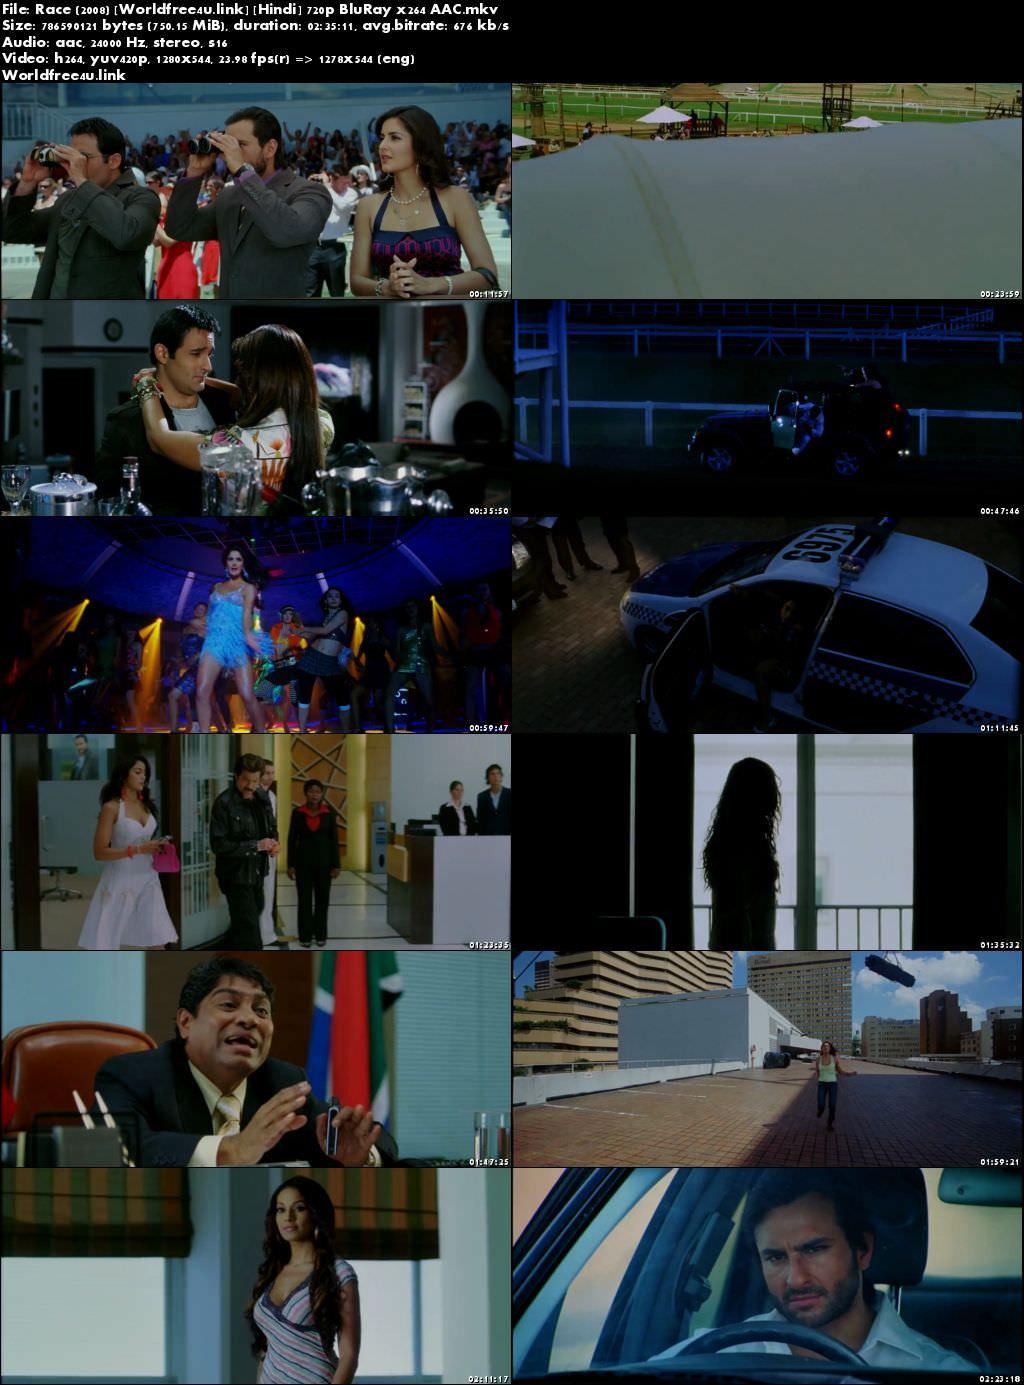 Screen Shoot of Race 2008 Full Hindi Movie Download BRRip 720p Watch Online In Hd